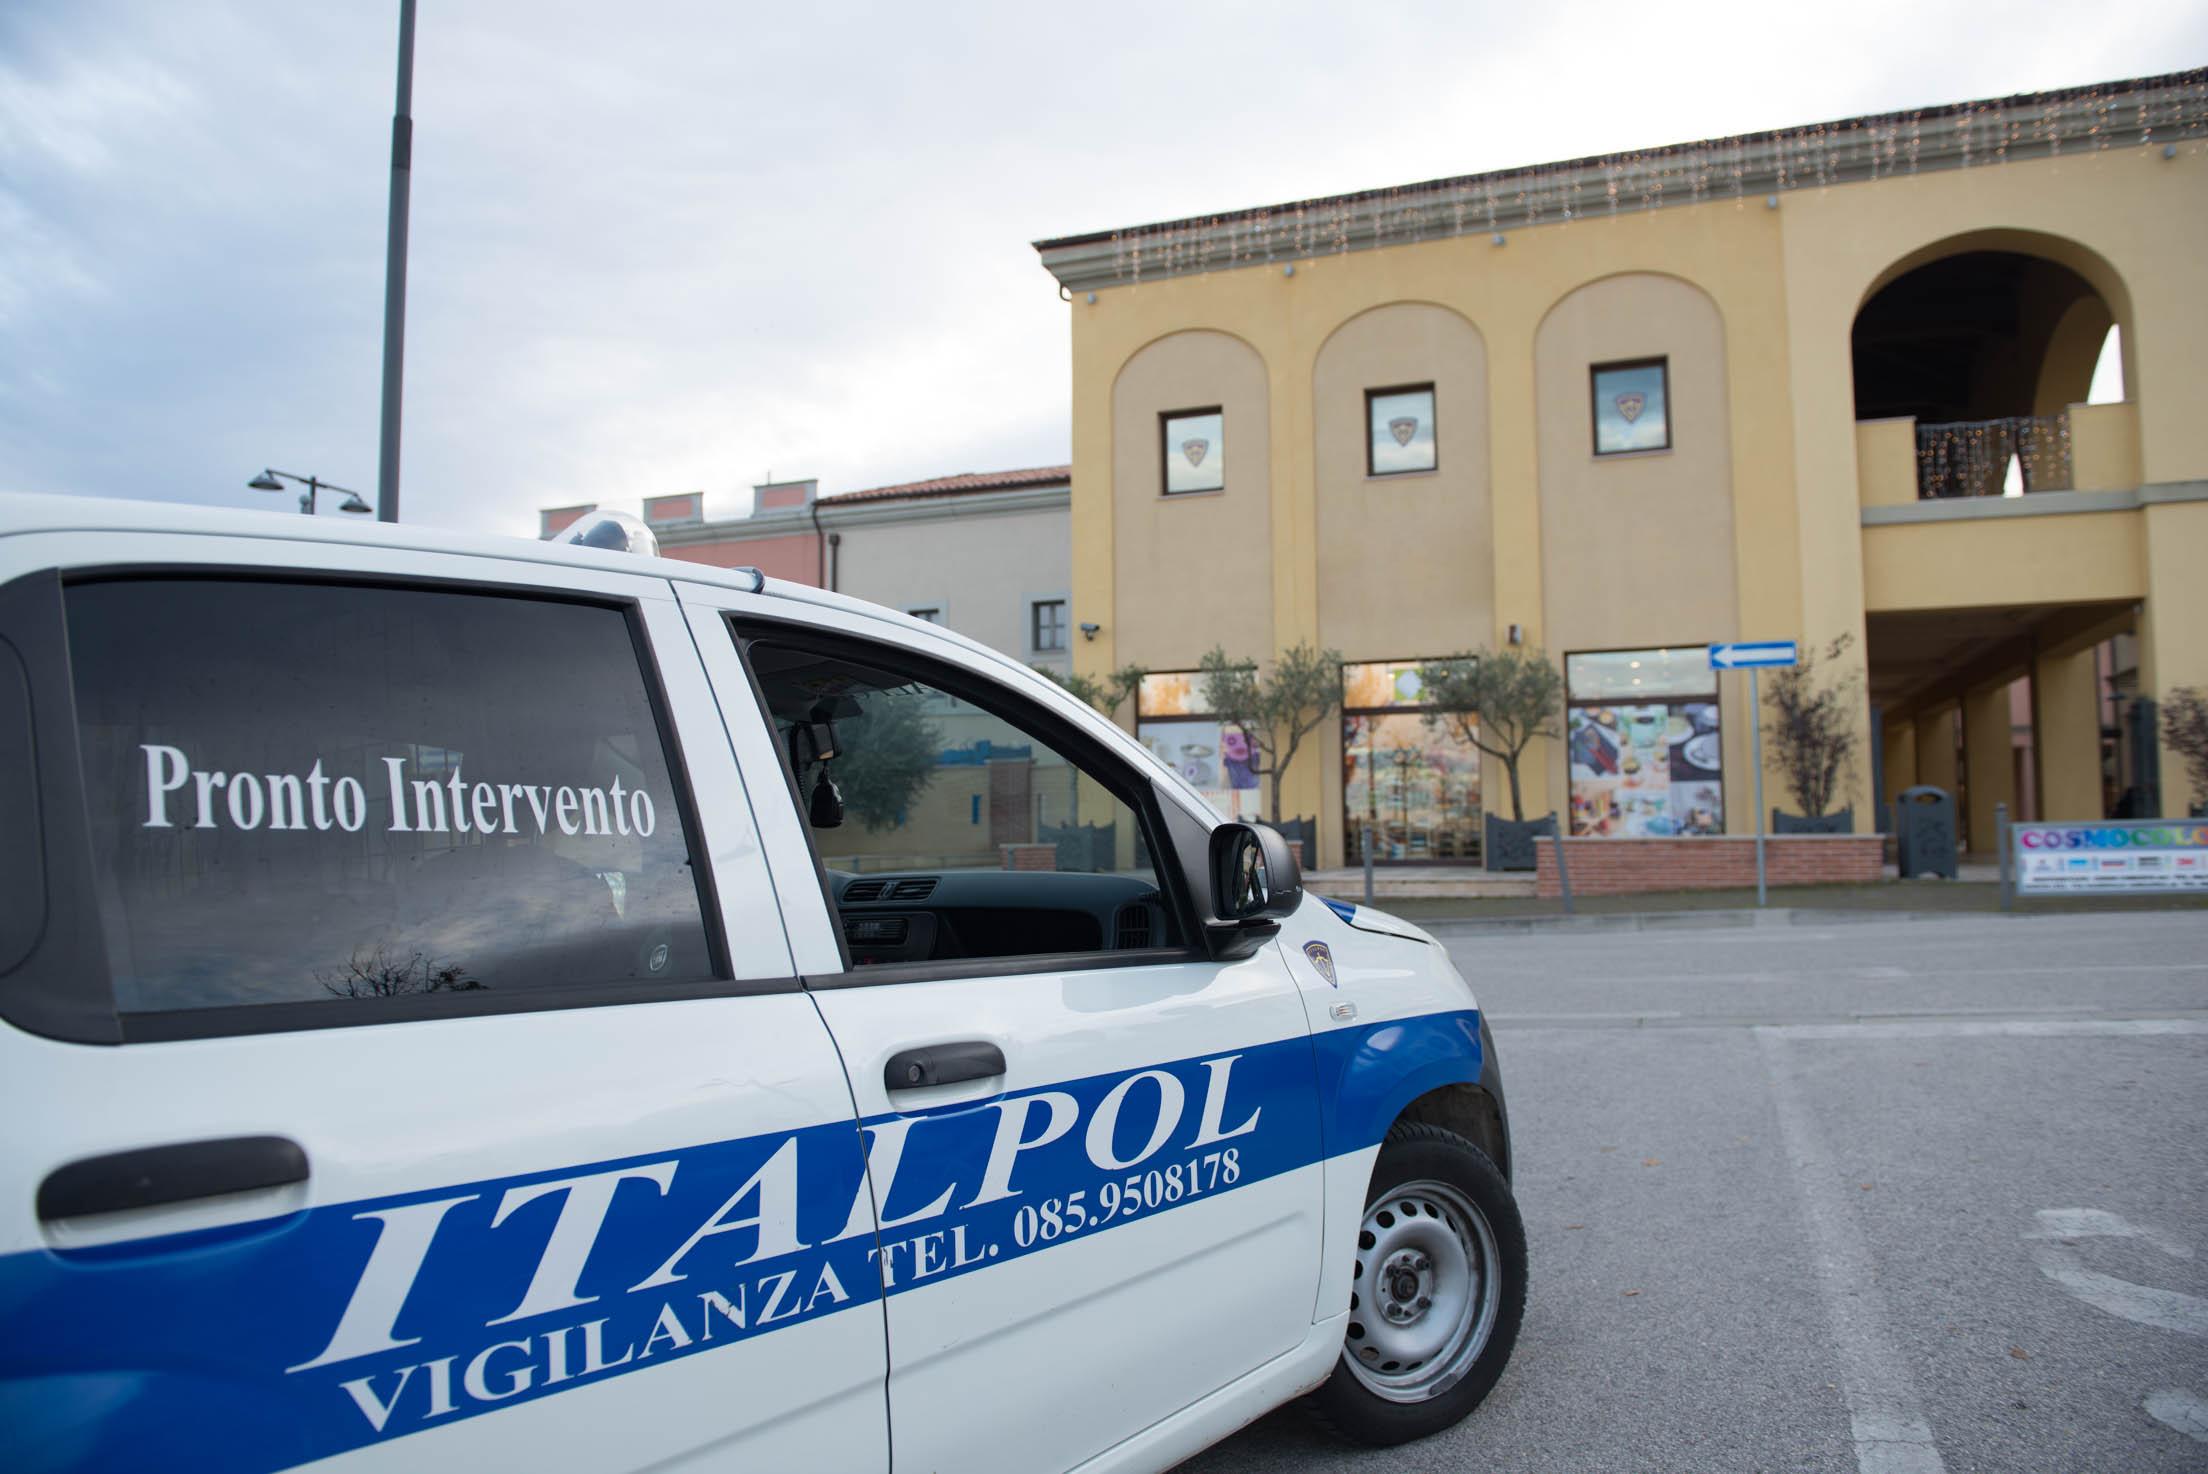 Italpol Global Security